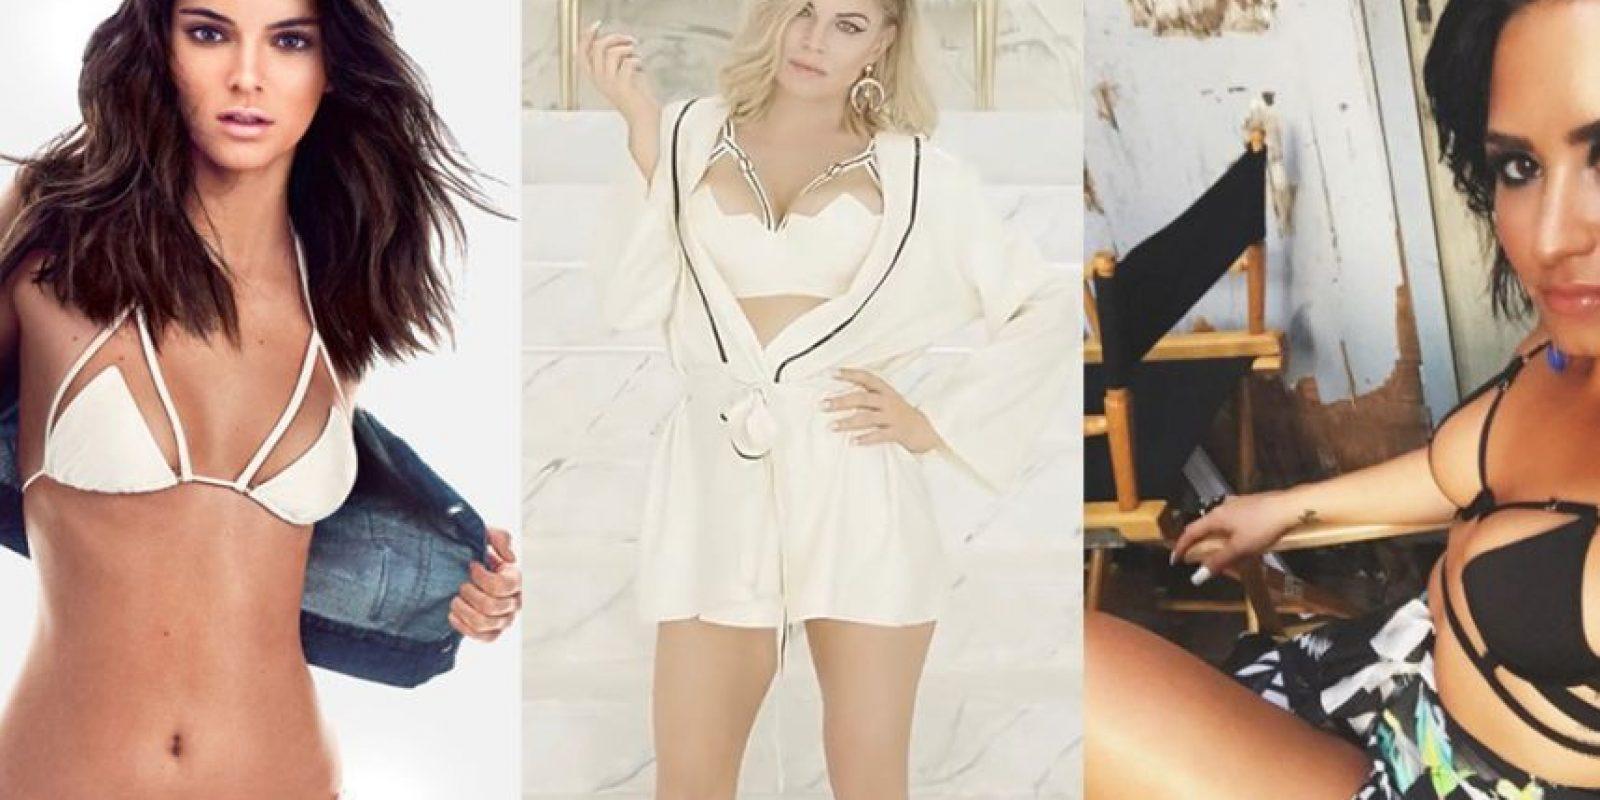 Kendall Jenner, Fergie y Demi Lovato Foto:GQ Magazine, Vevo, Instagram @DemiLovato. Imagen Por: